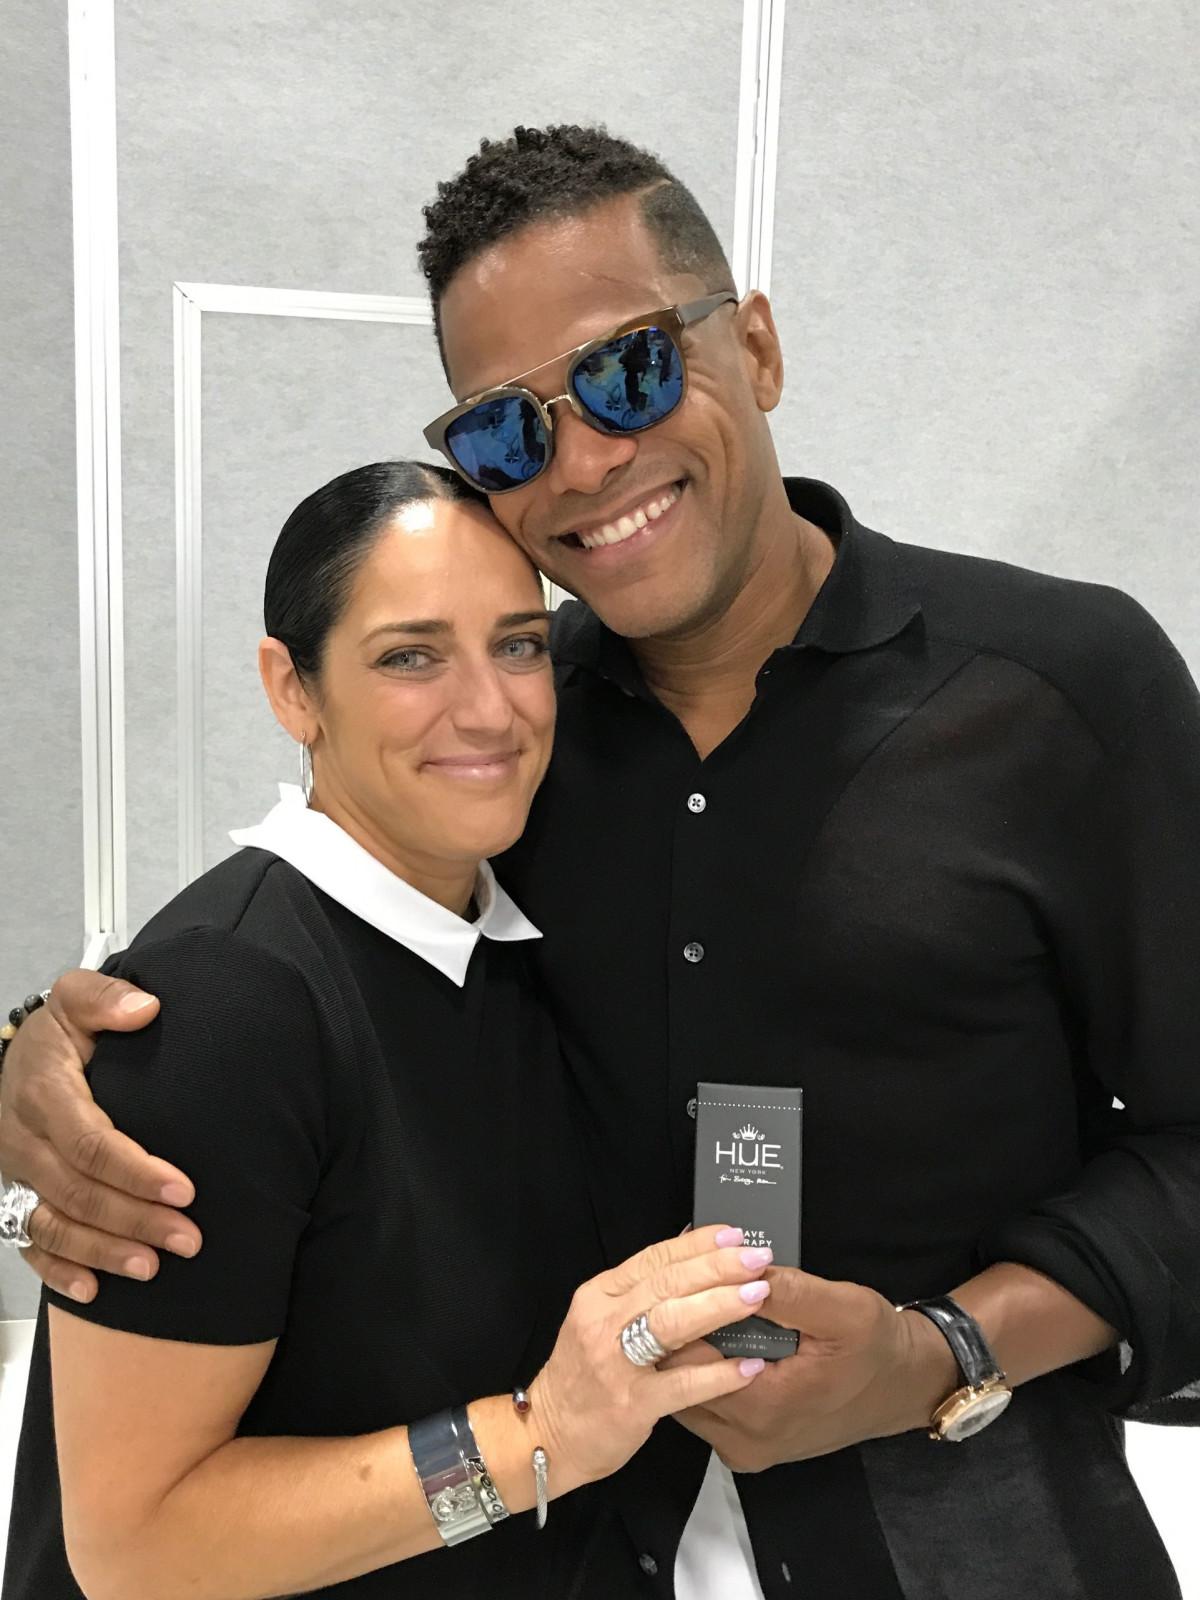 Jennifer Estrada and Maxwell at Cosmoprof 2017